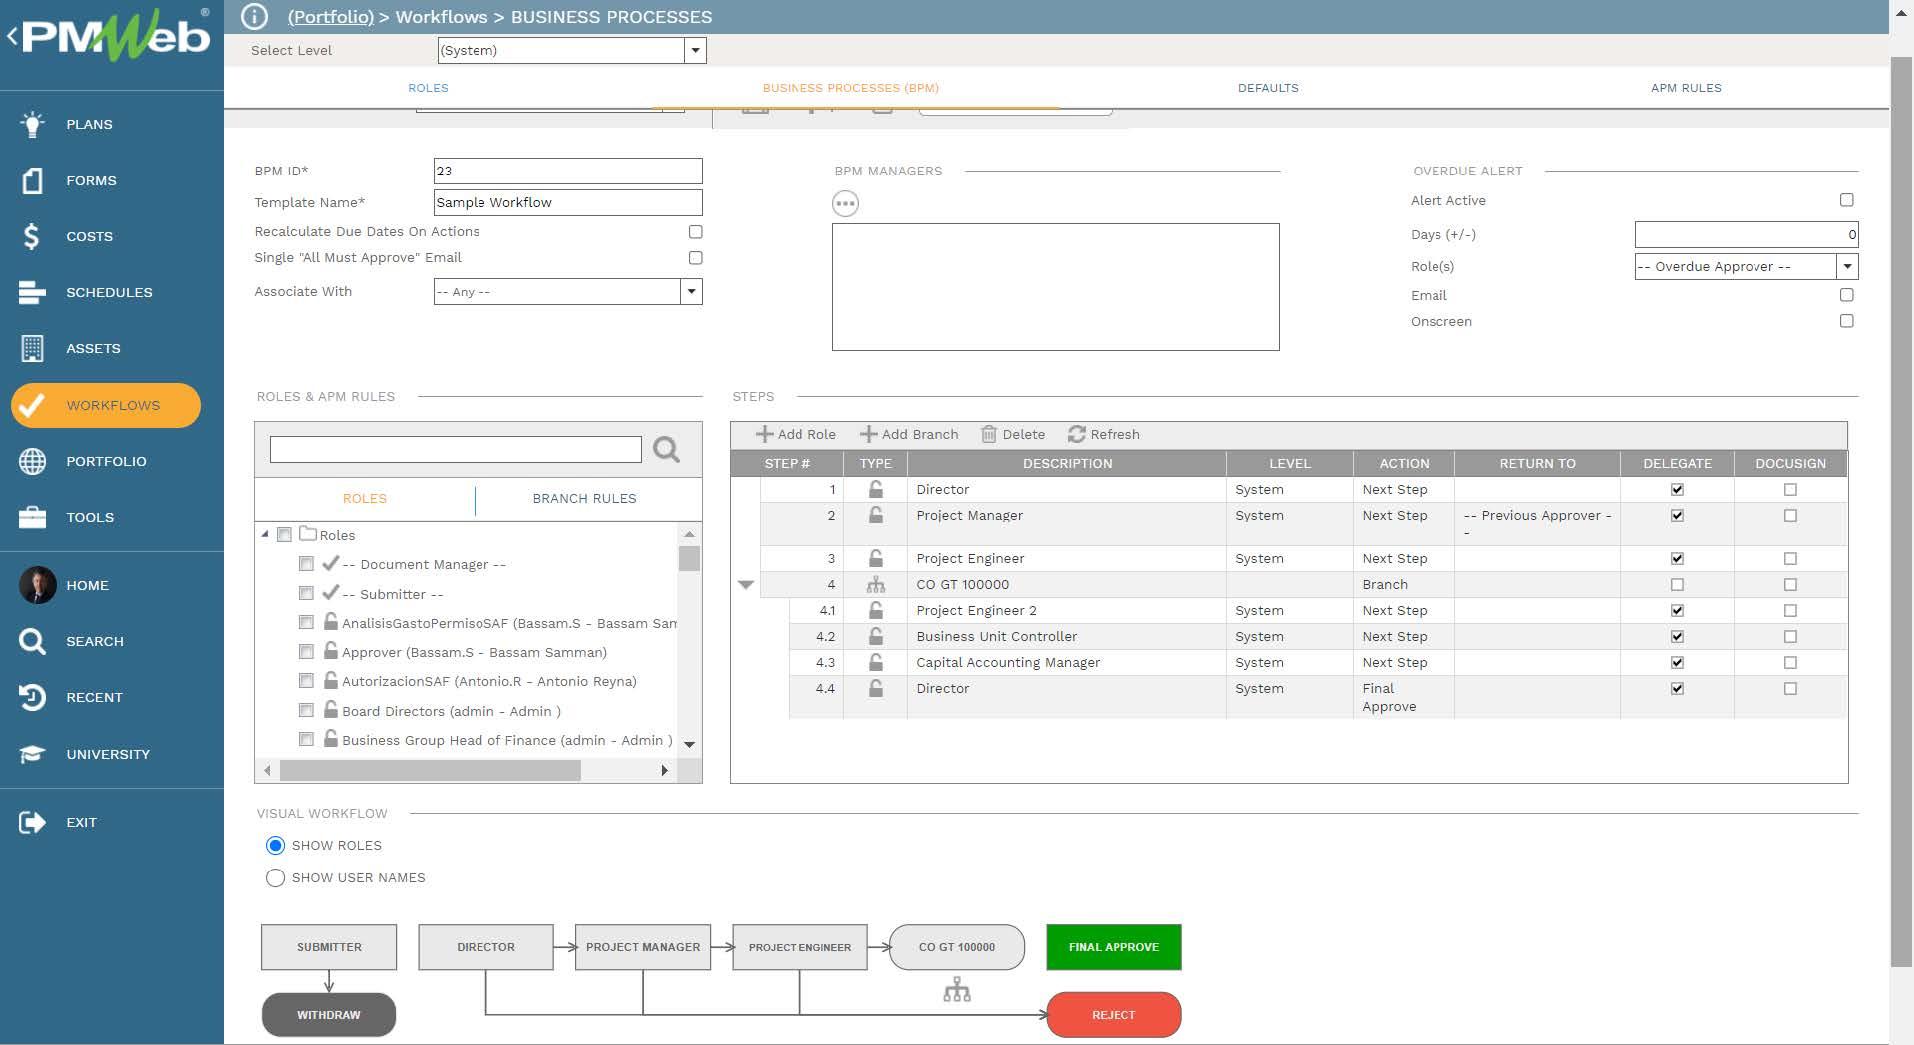 PMWeb 7 Workflows Business Processes (BPM)